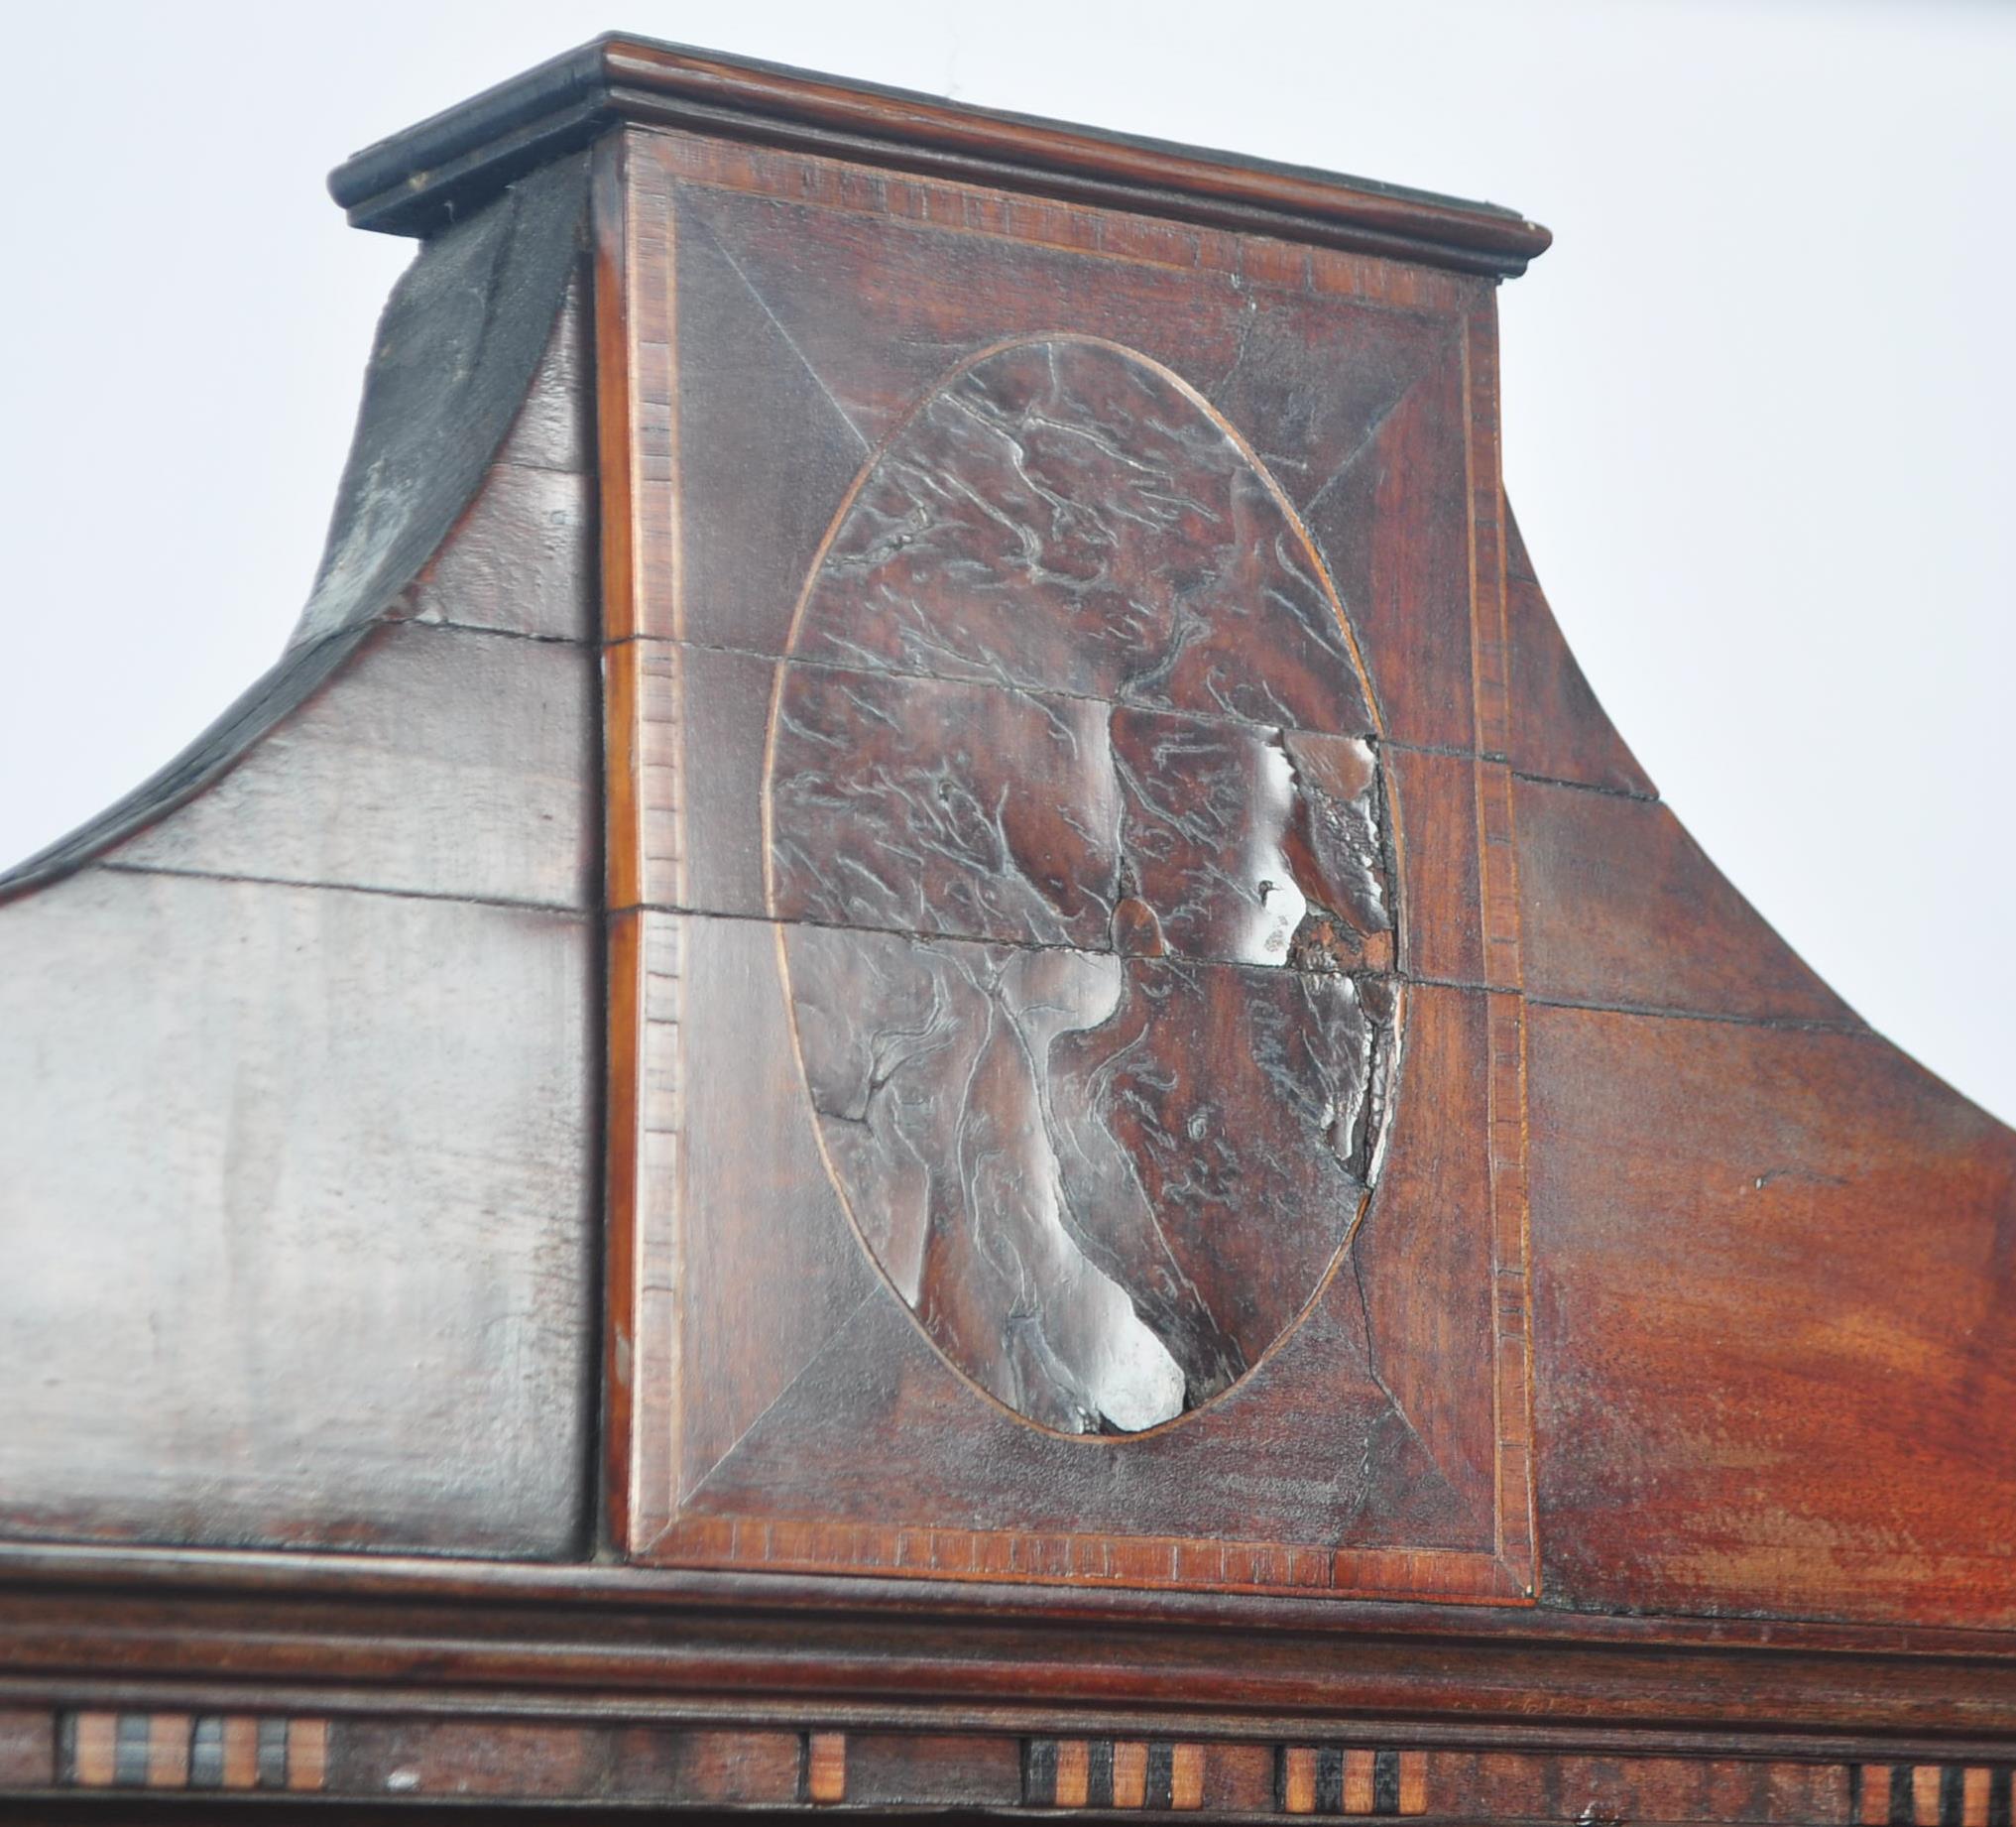 19TH CENTURY MAHOGANY & SATINWOOD DISPLAY CABINET VITRINE - Image 3 of 5